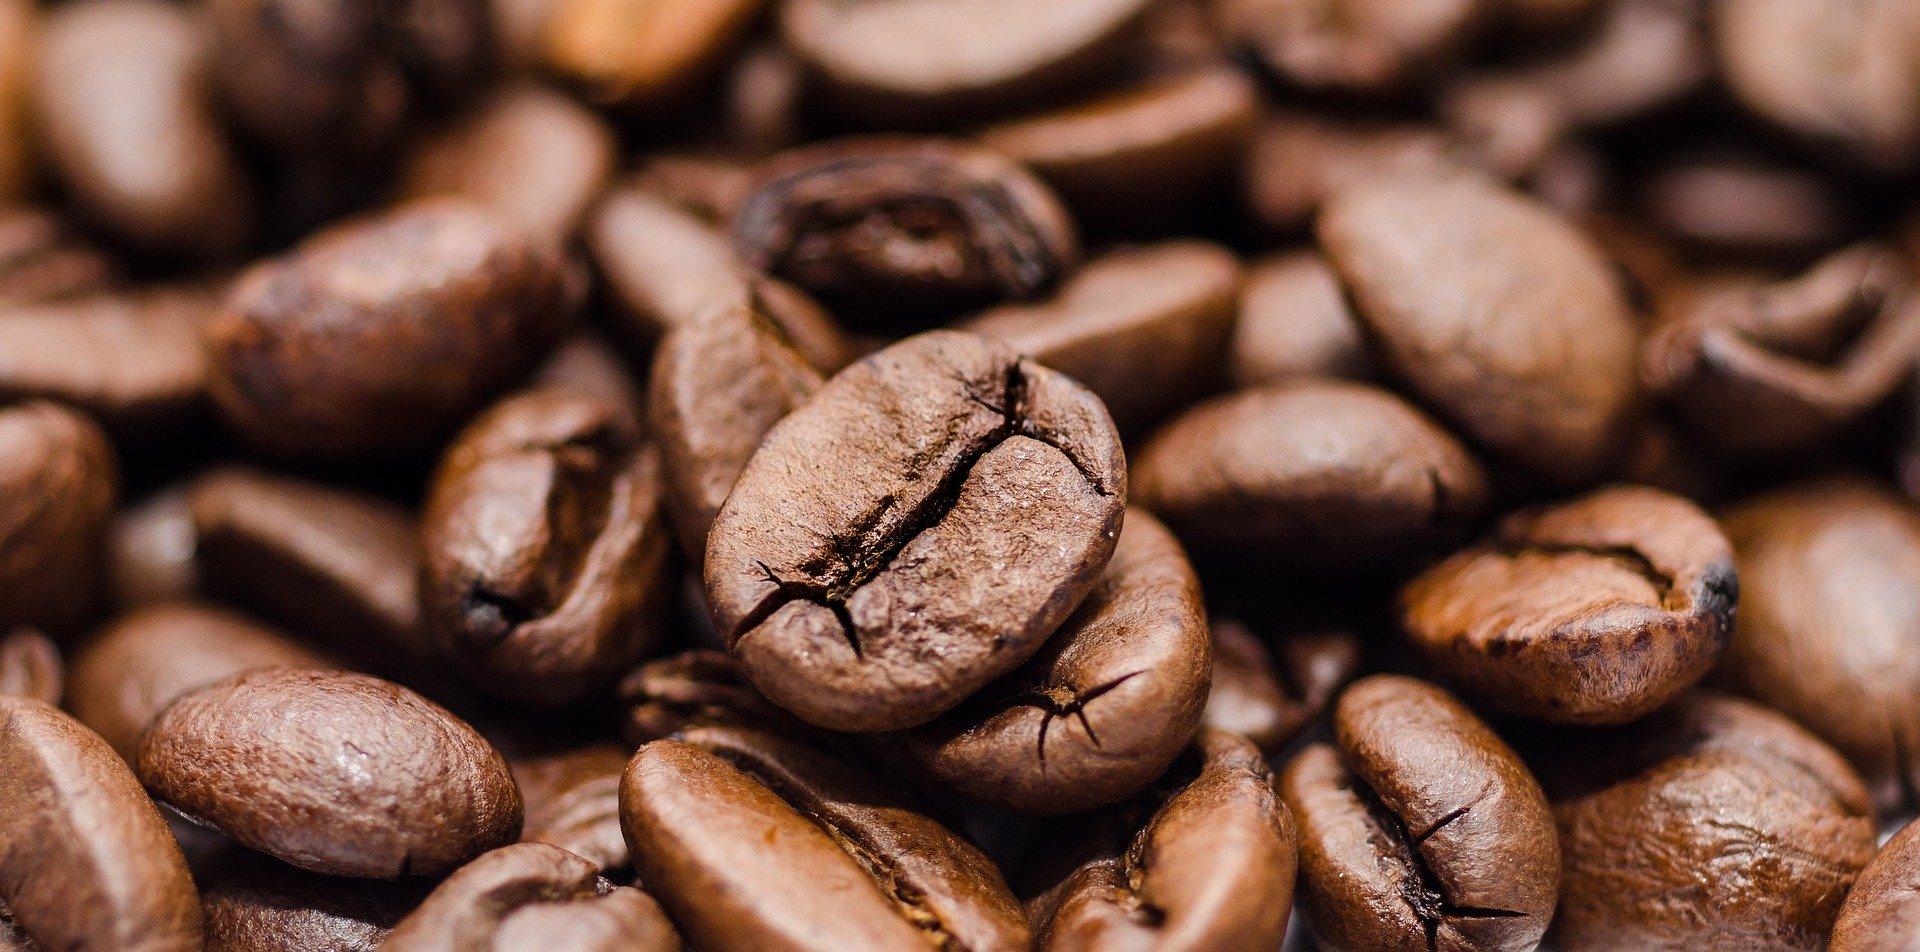 10 Best Espresso Beans of 2020